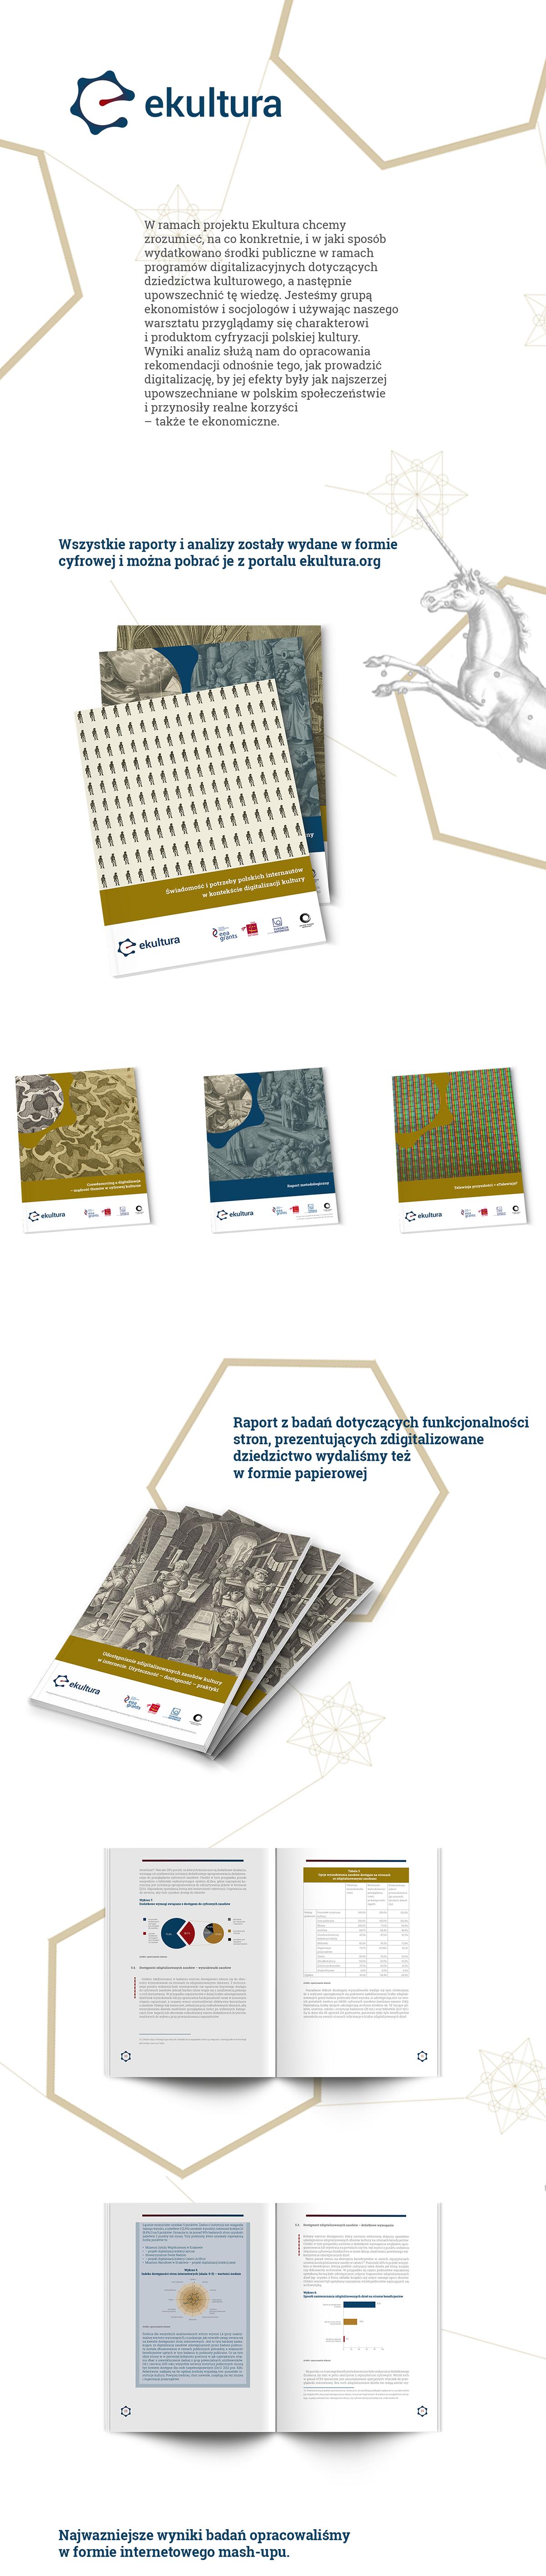 digitalization digitalizacja culture kultura ekultura e-Culture raport badania